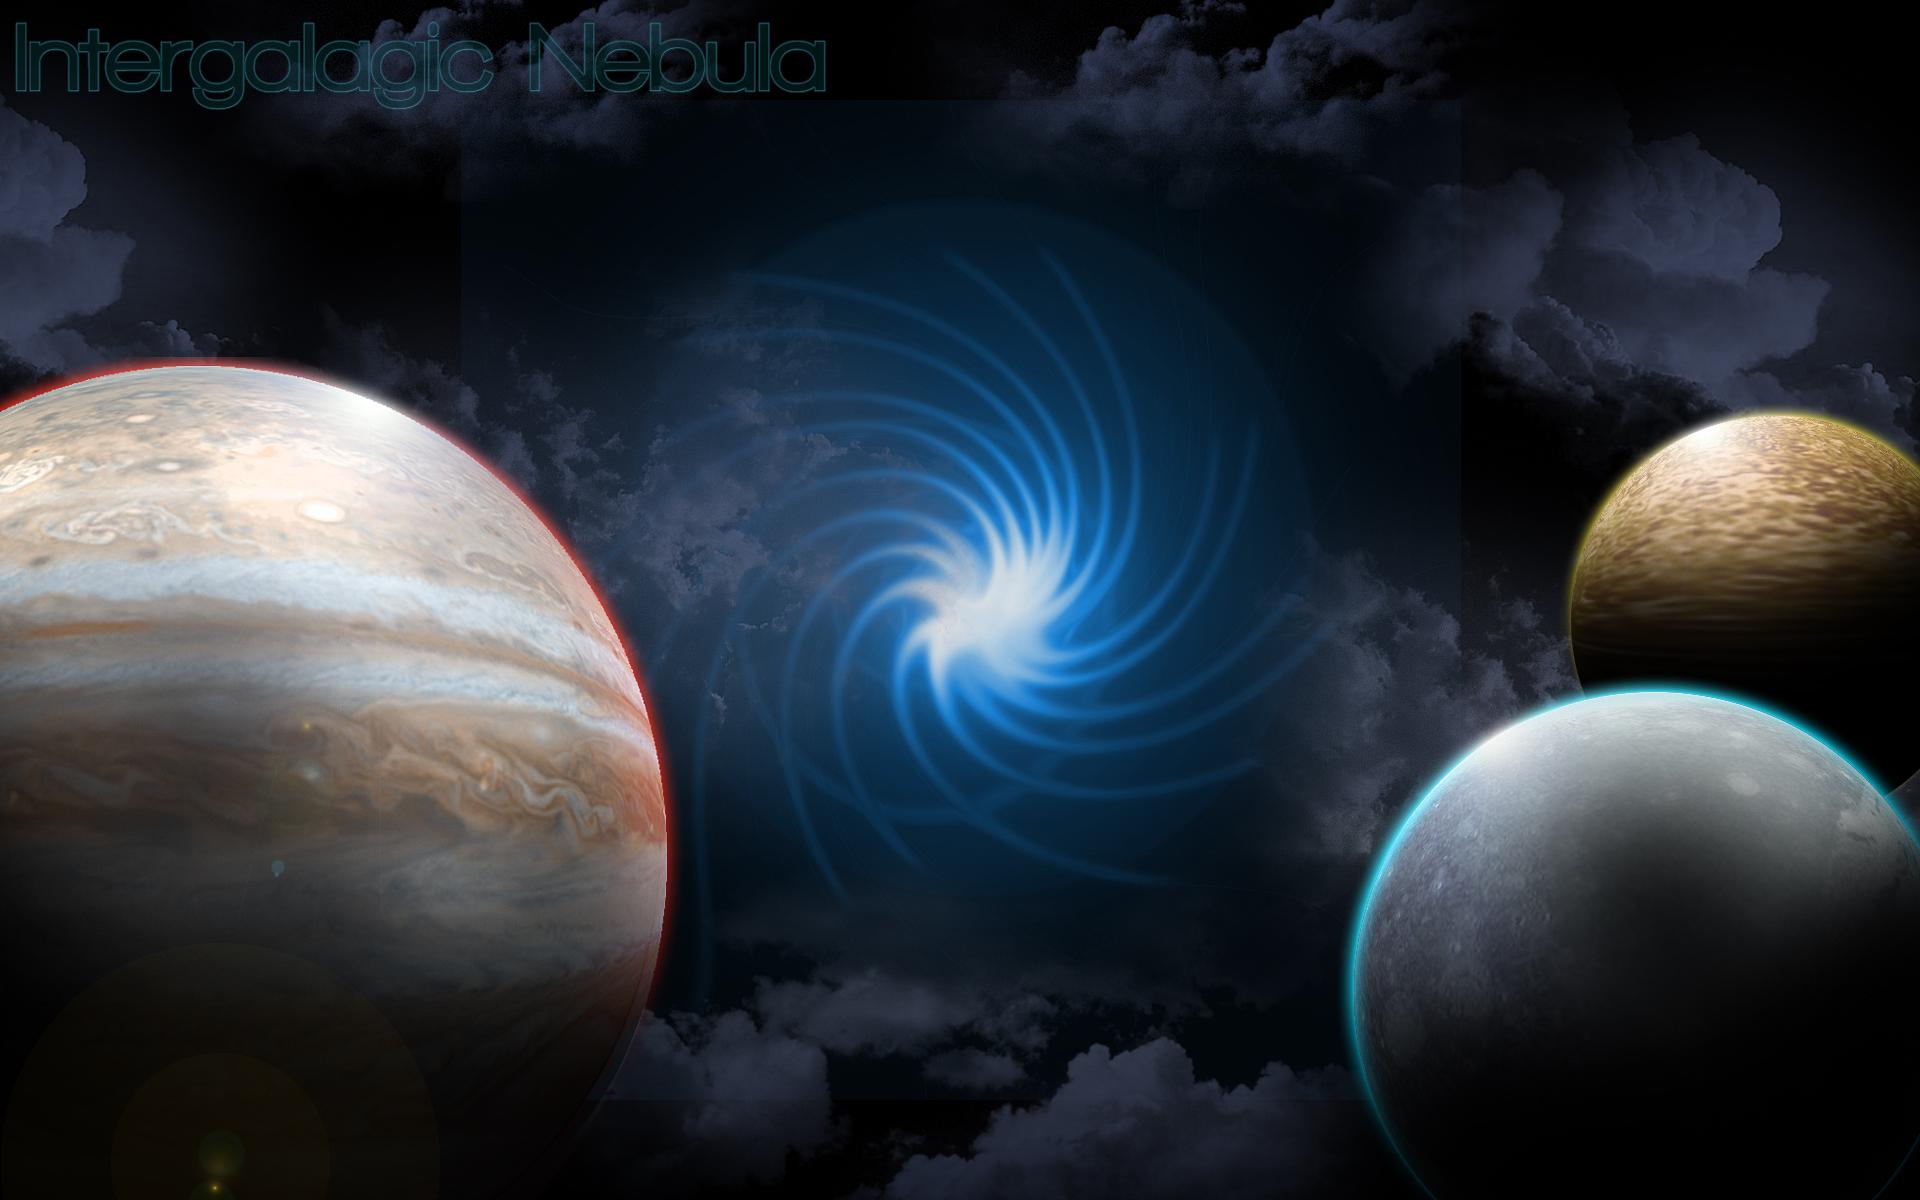 Intergalactic Nebula Wallpaper by cruzerDESIGN 1920x1200